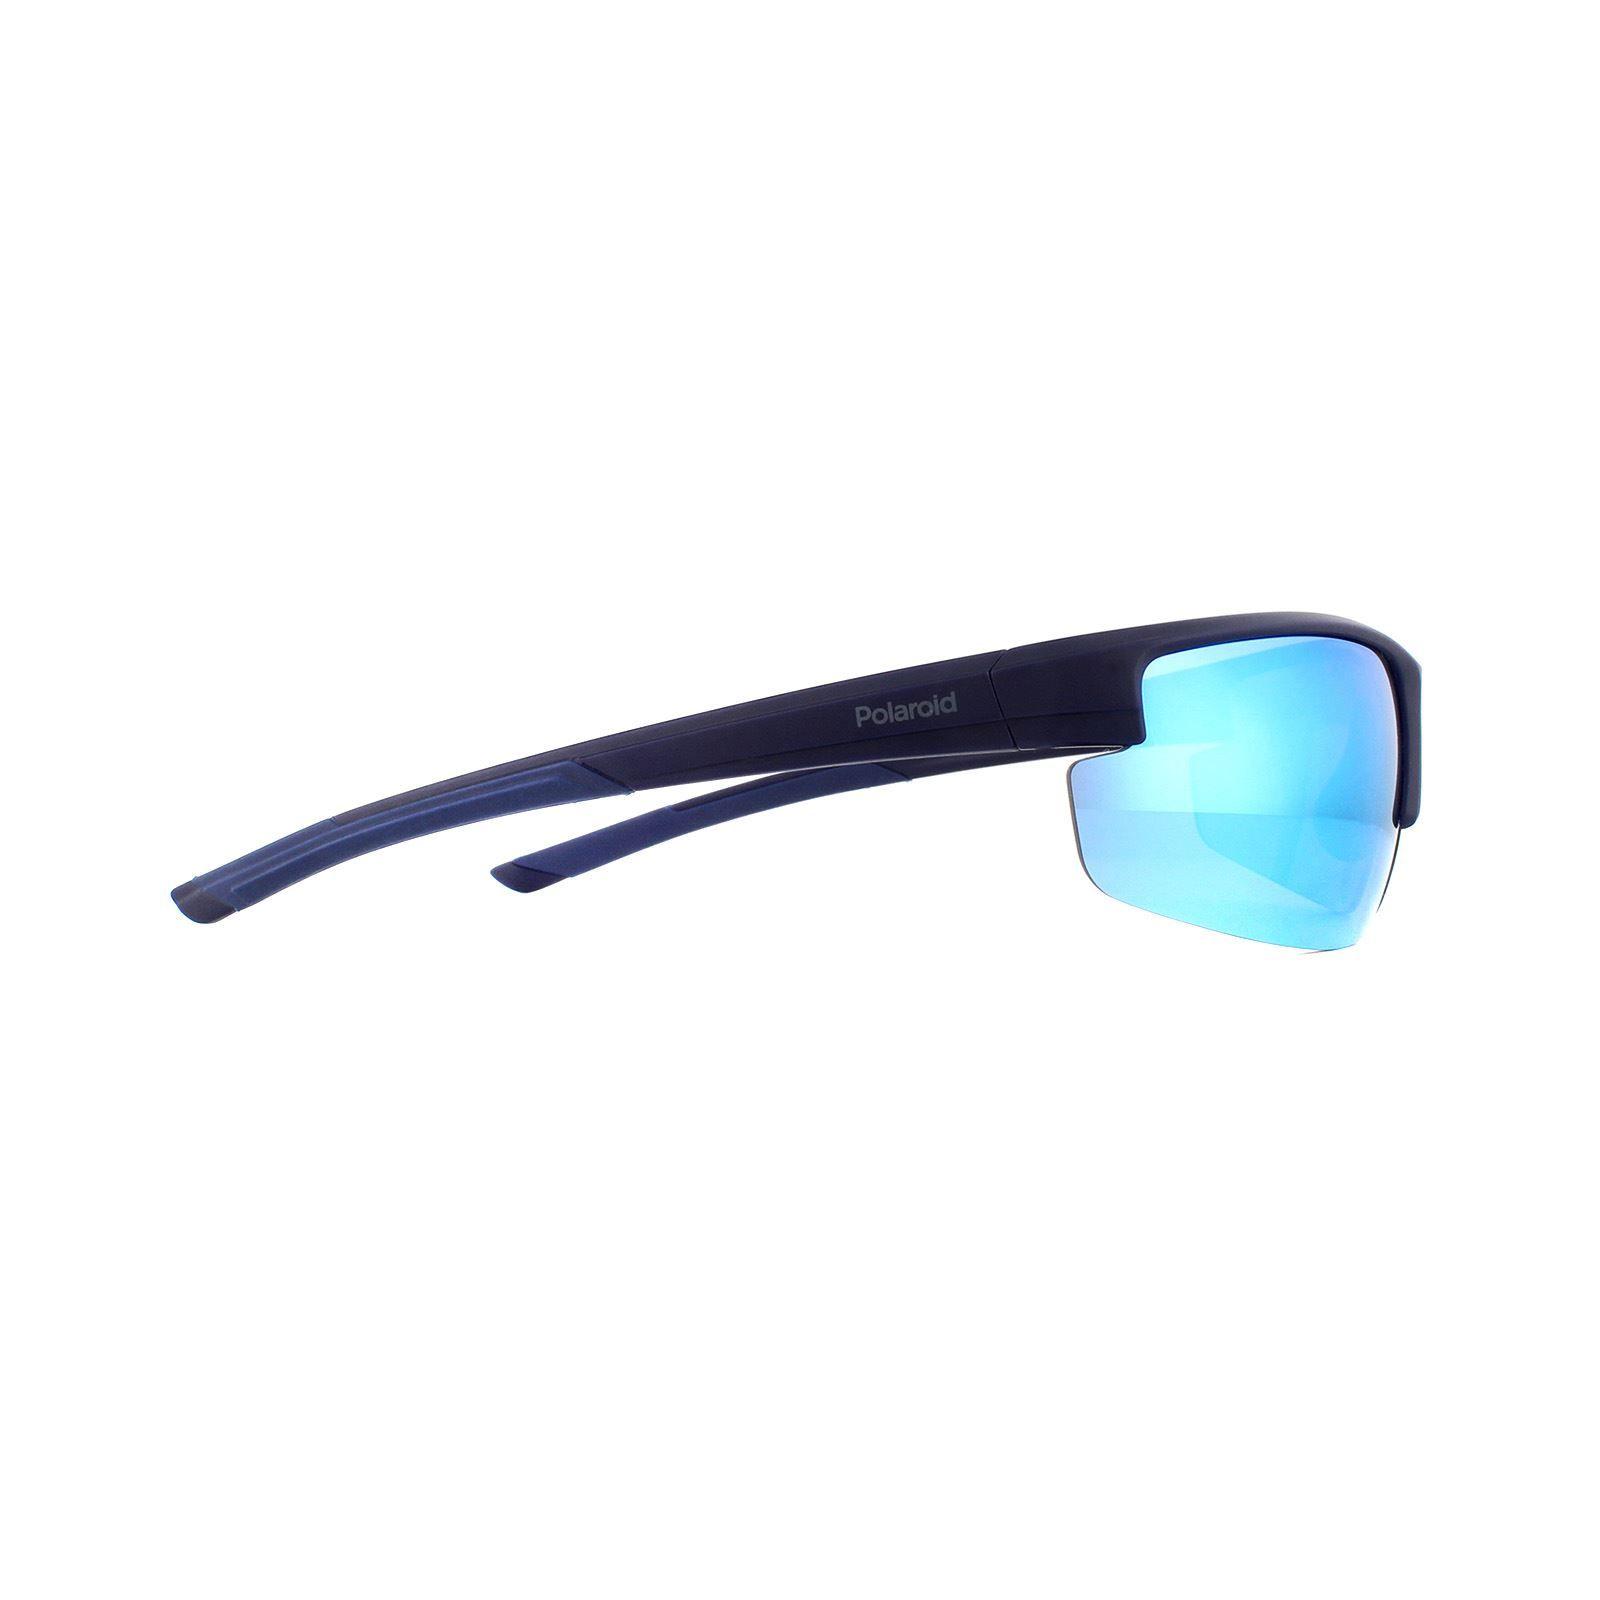 Polaroid Sport Sunglasses 7027/S PJP 5X Blue Blue Mirror Polarized